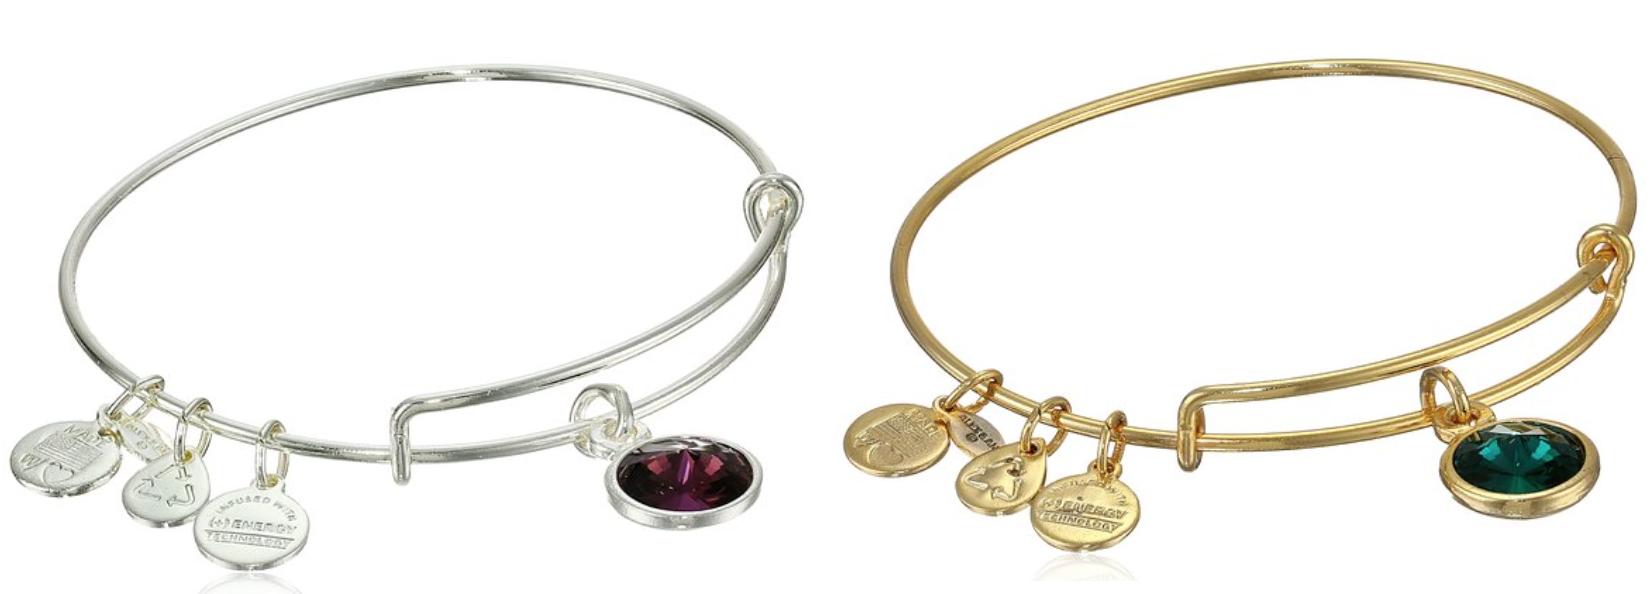 mothers day gifts, mothers day 2015, mothers day, best mothers day gifts, gift ideas, mothers day gift ideas, jewelry